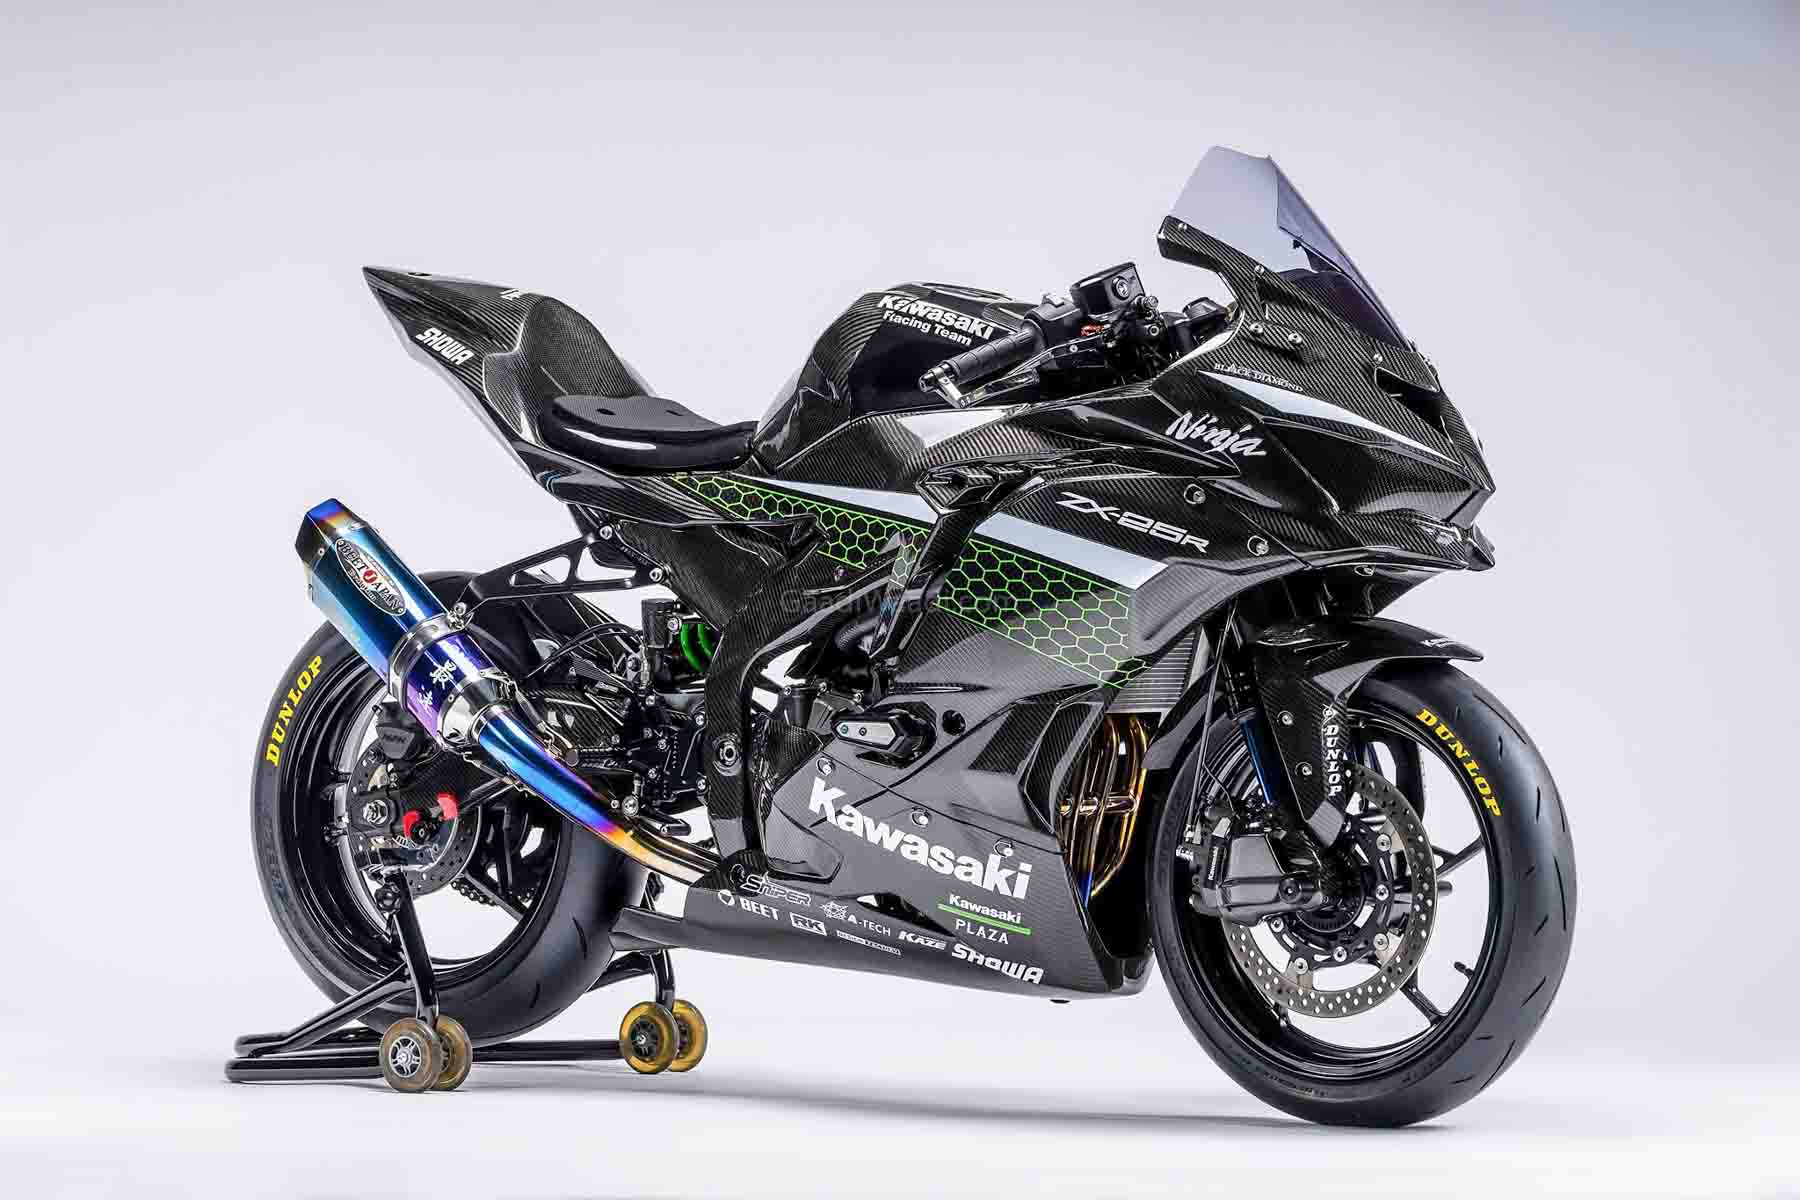 4-Cylinder Kawasaki Ninja 250 (ZX-25R) Racer Custom Revealed Officially thumbnail